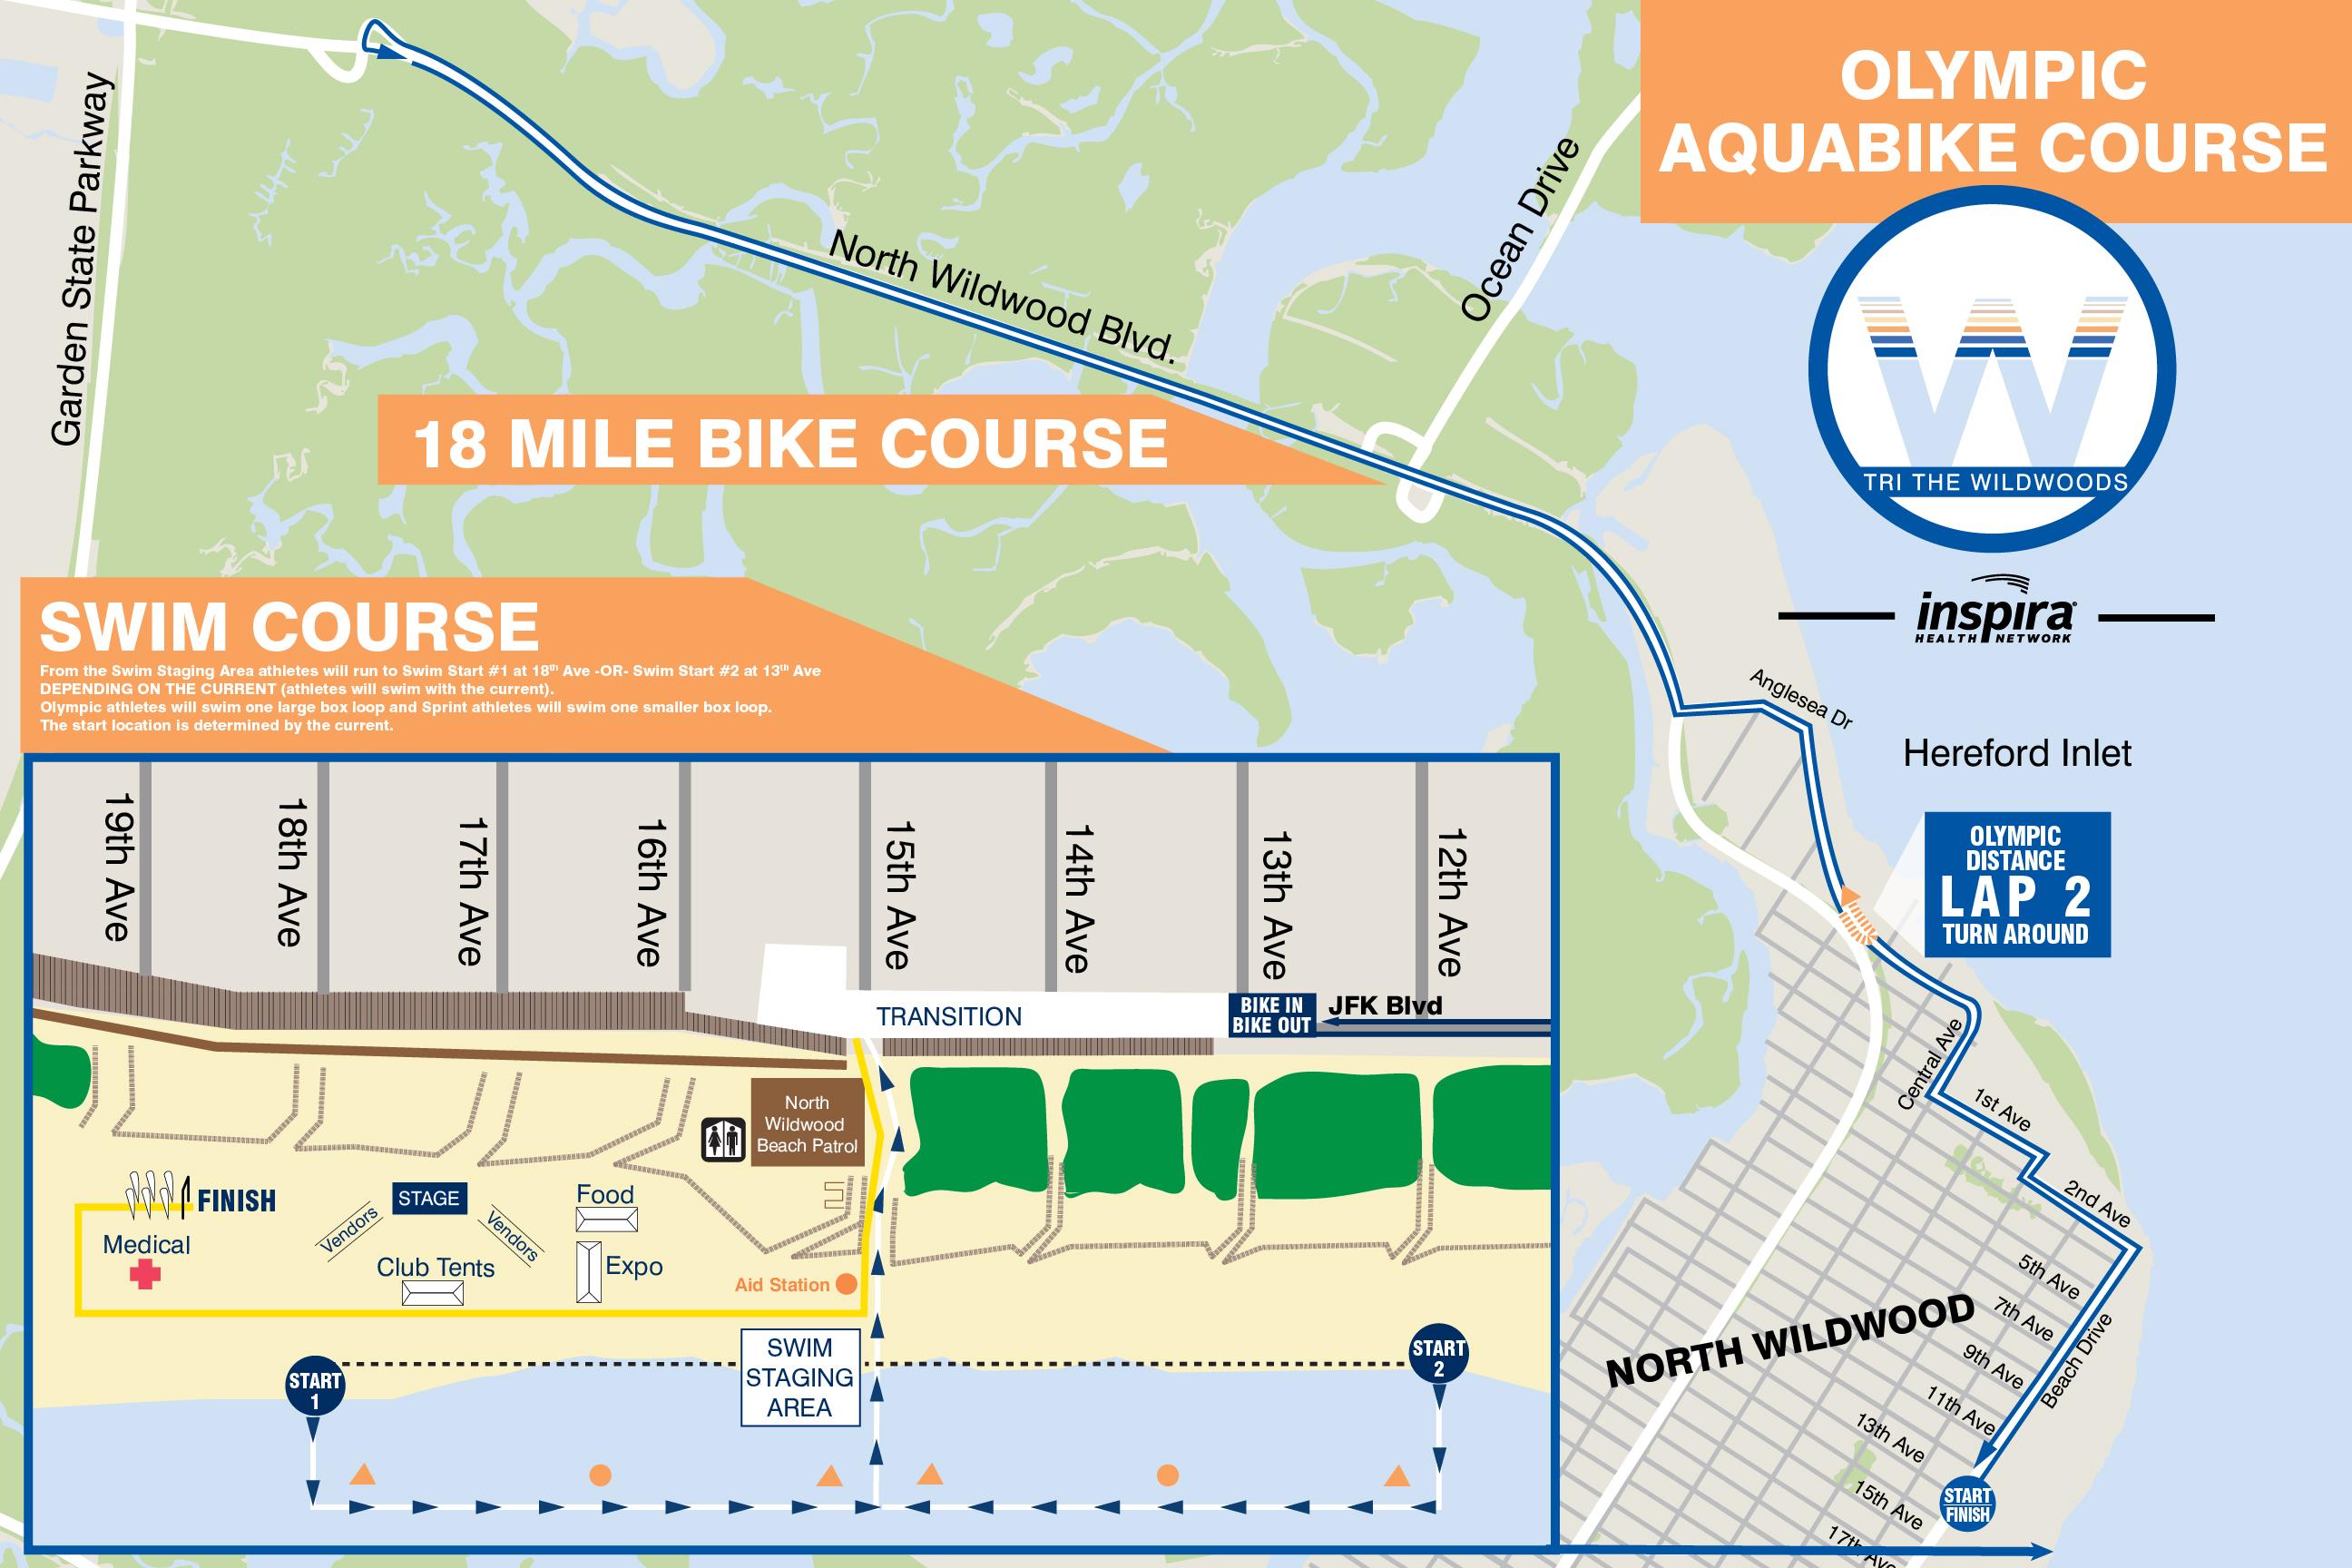 Aquabike Olympic Course